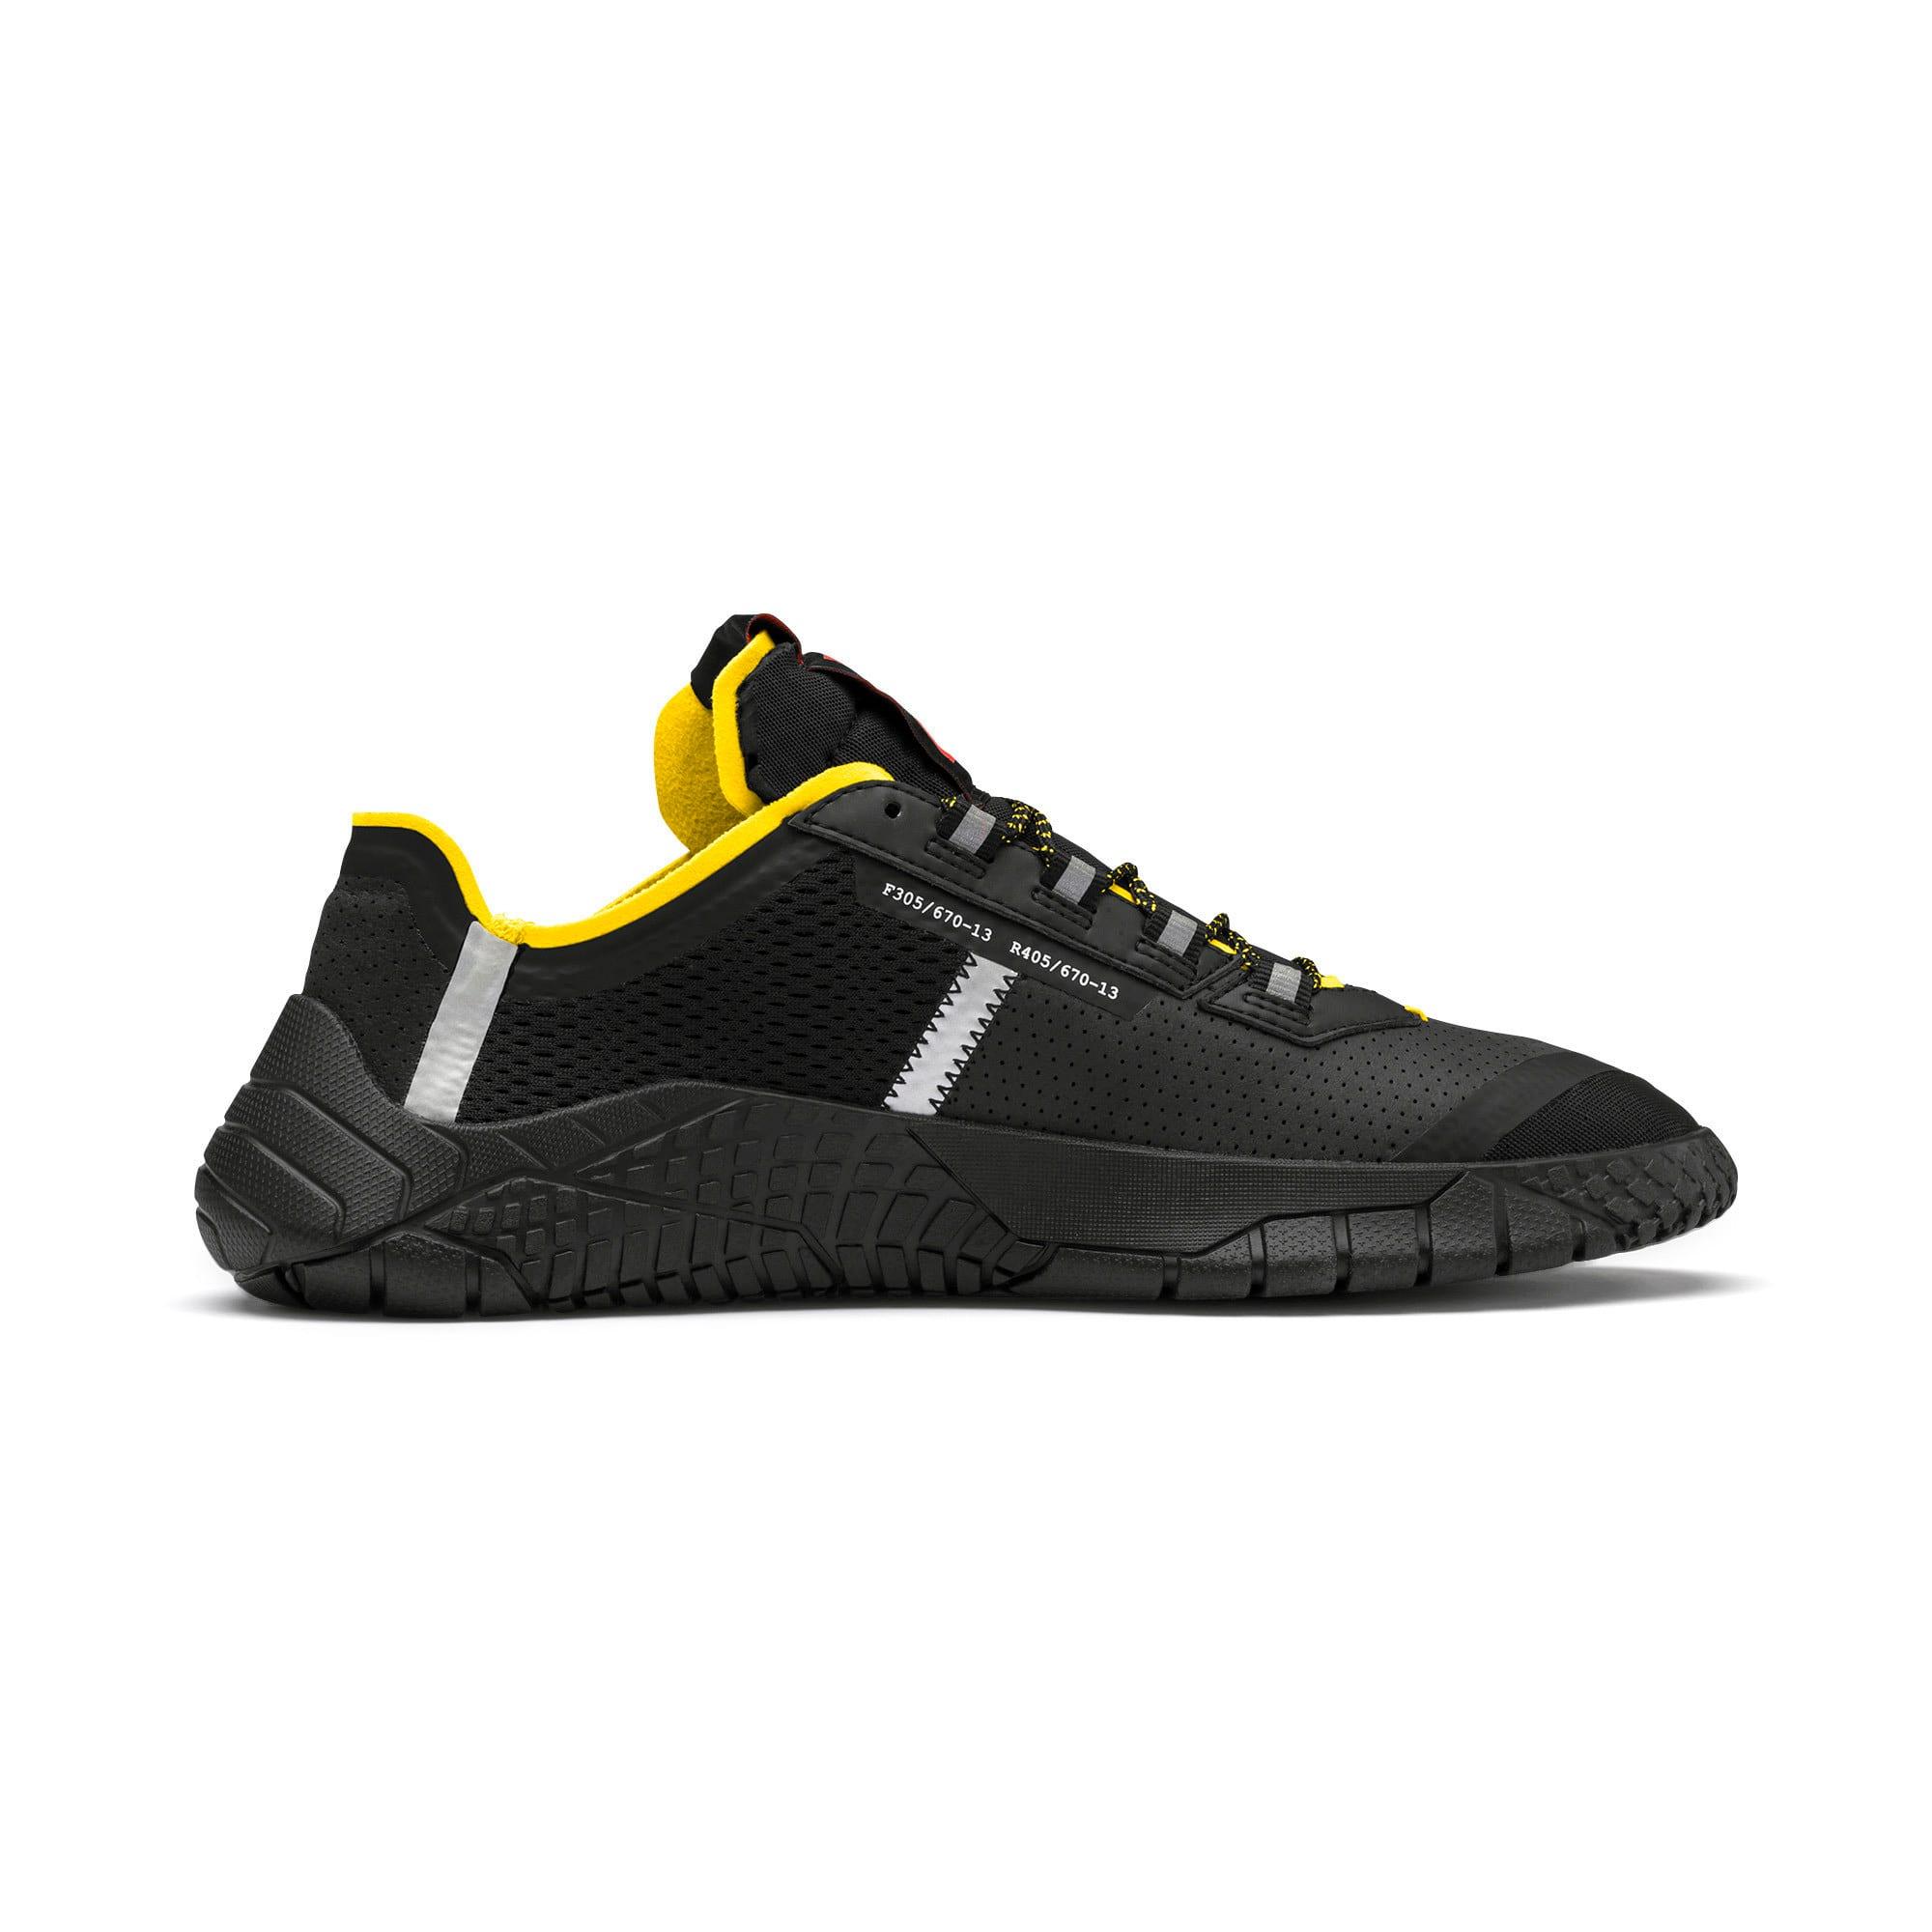 Thumbnail 5 of Replicat-X Pirelli Motorsport Shoes, Black-Black-Cyber Yellow, medium